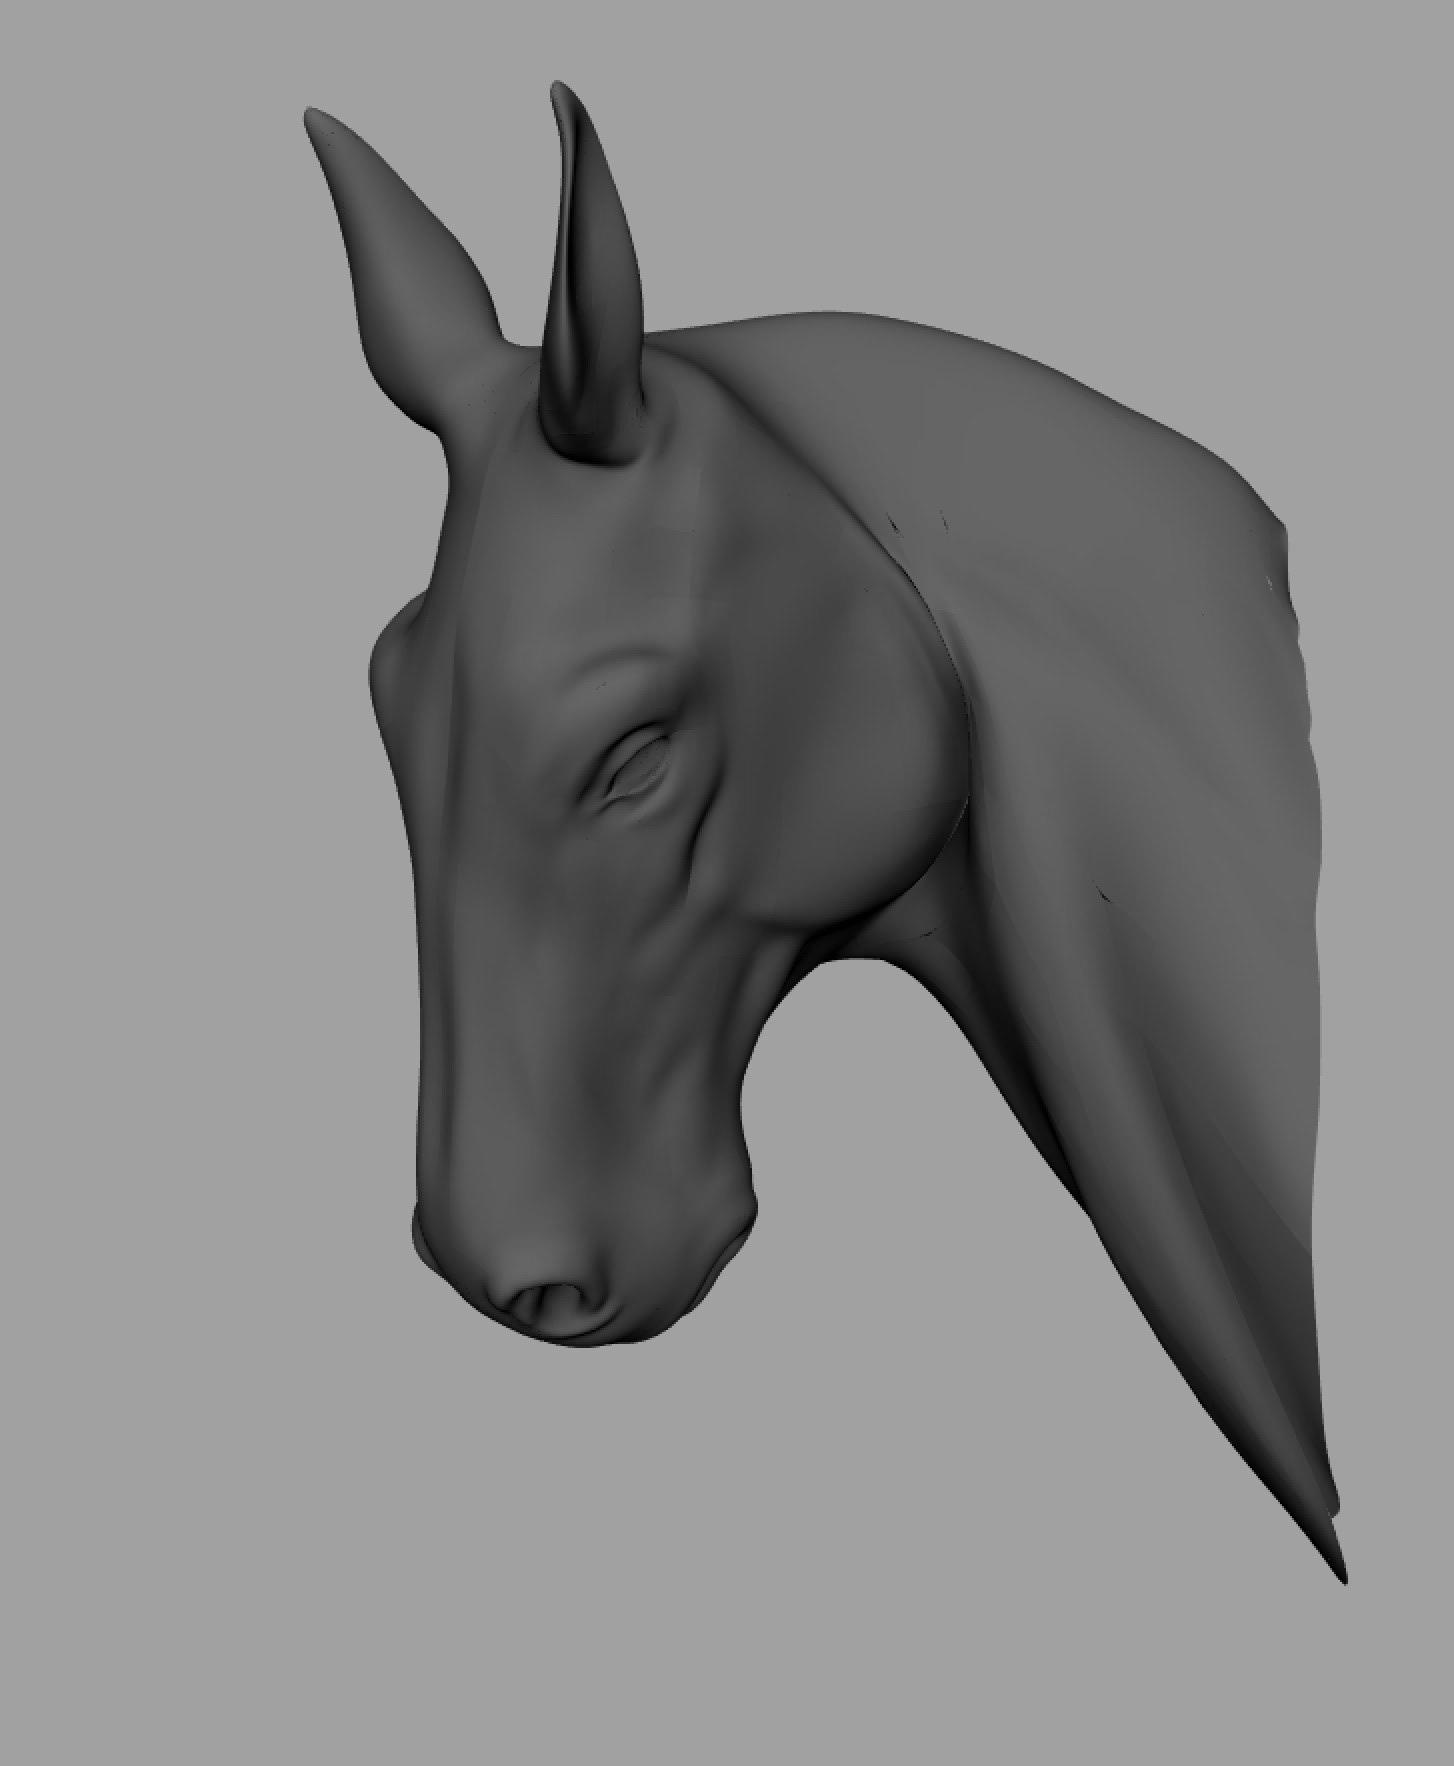 JJUTT [joaquin e. jutt | artist] - Digital Horse Busts